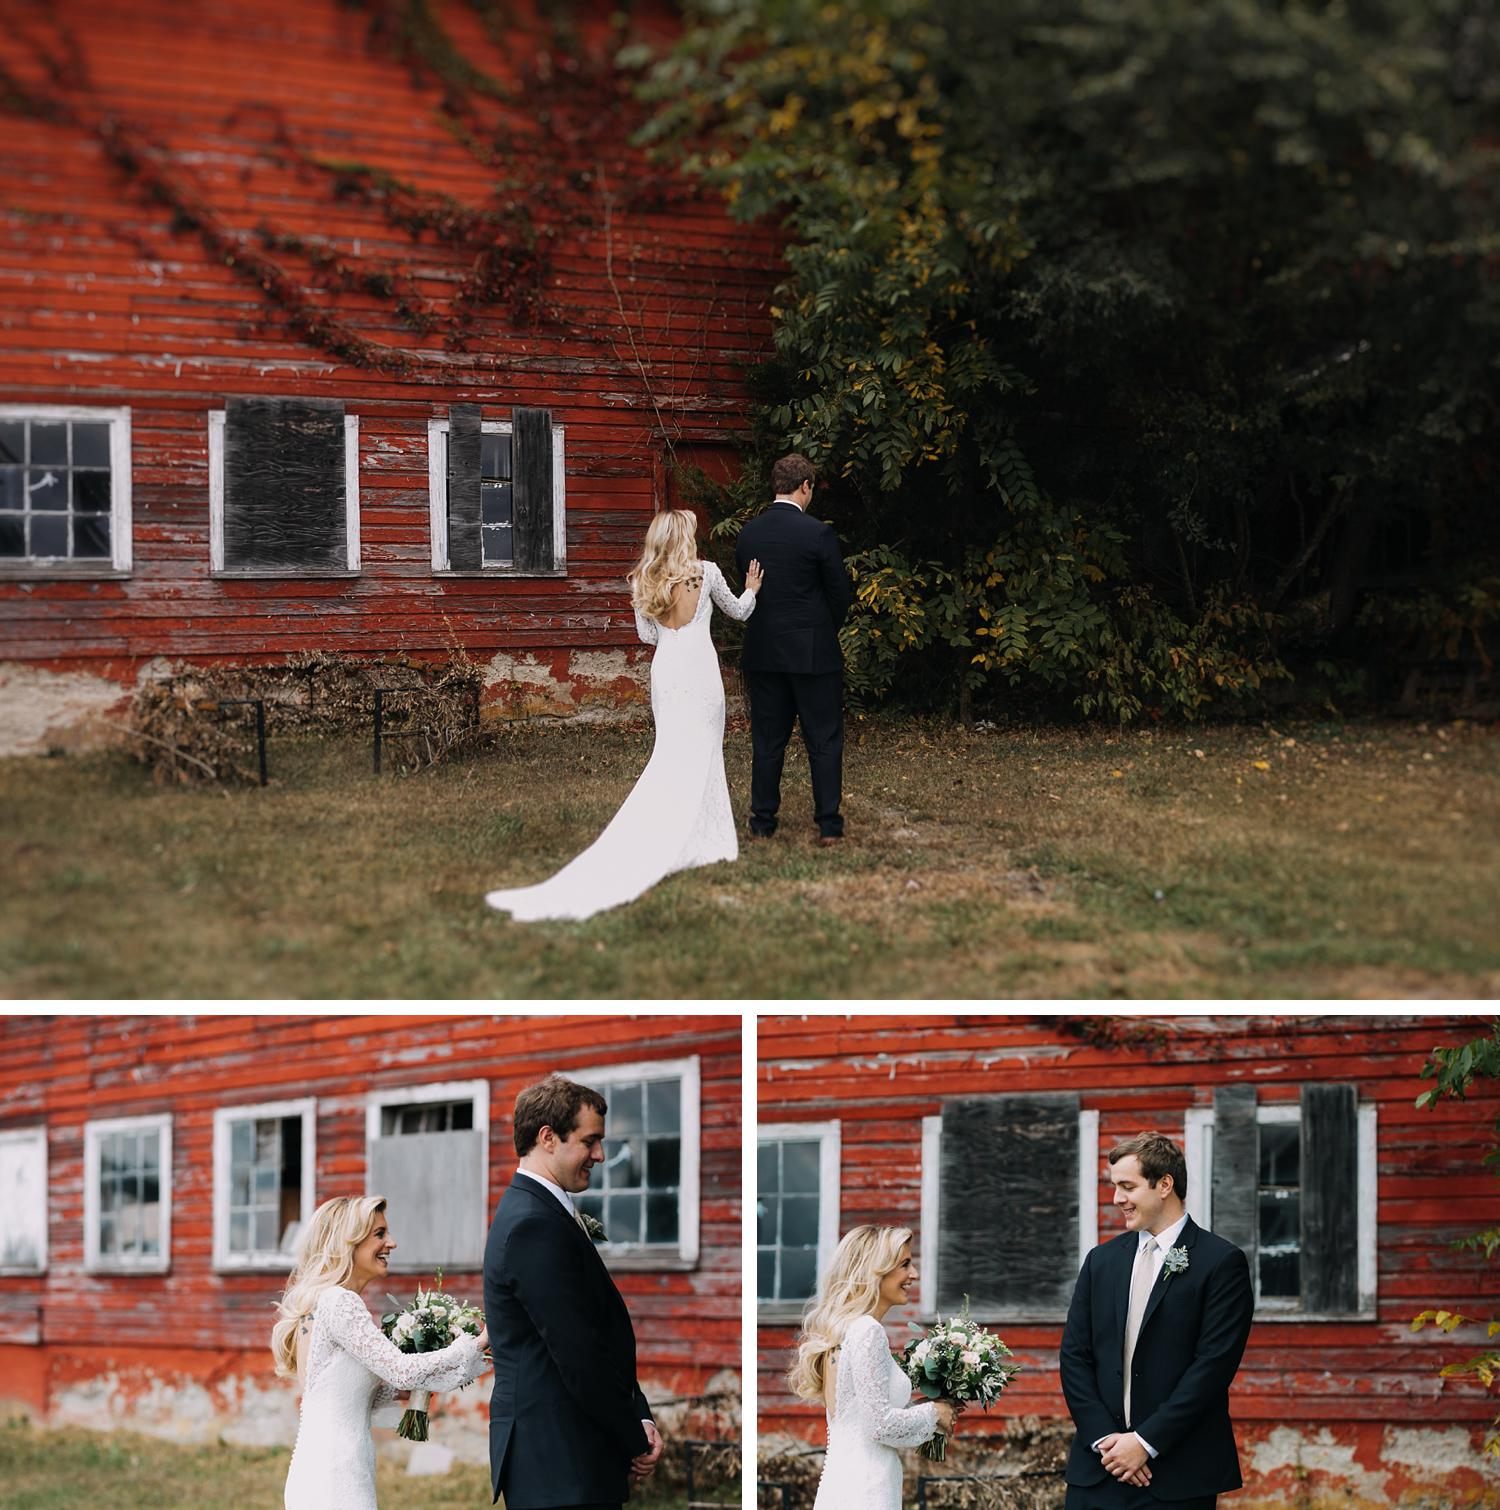 Conservatory Sussex County Fairgrounds Augusta NJ Wedding Photography Steph Massaro